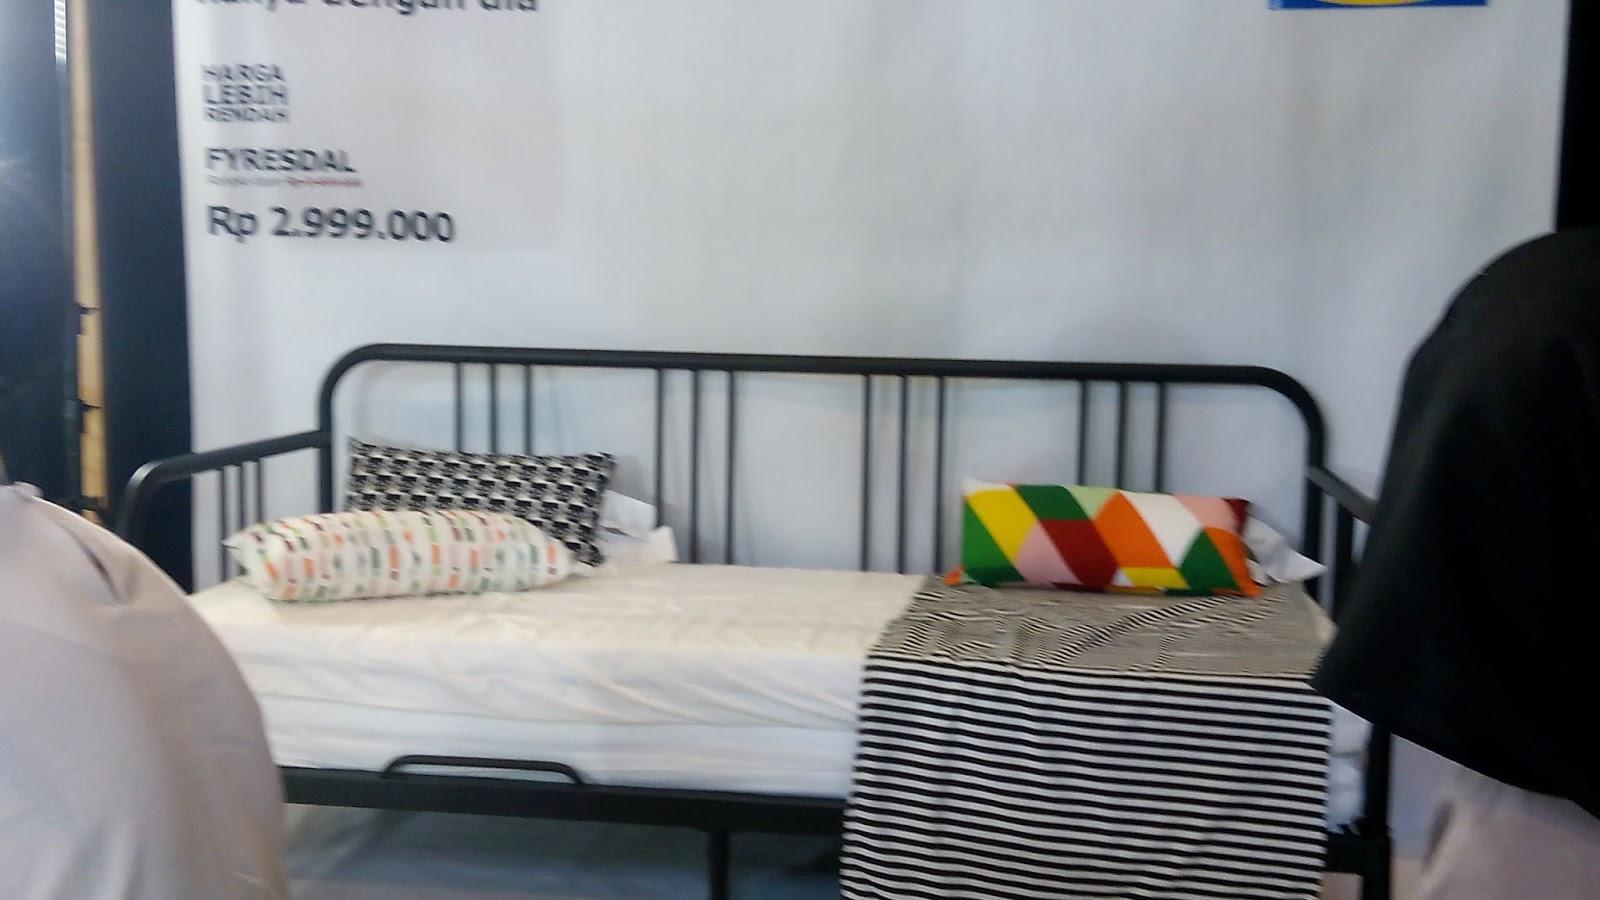 ikea katalog 2017 blog parenting keluarga lifestyle dan review. Black Bedroom Furniture Sets. Home Design Ideas